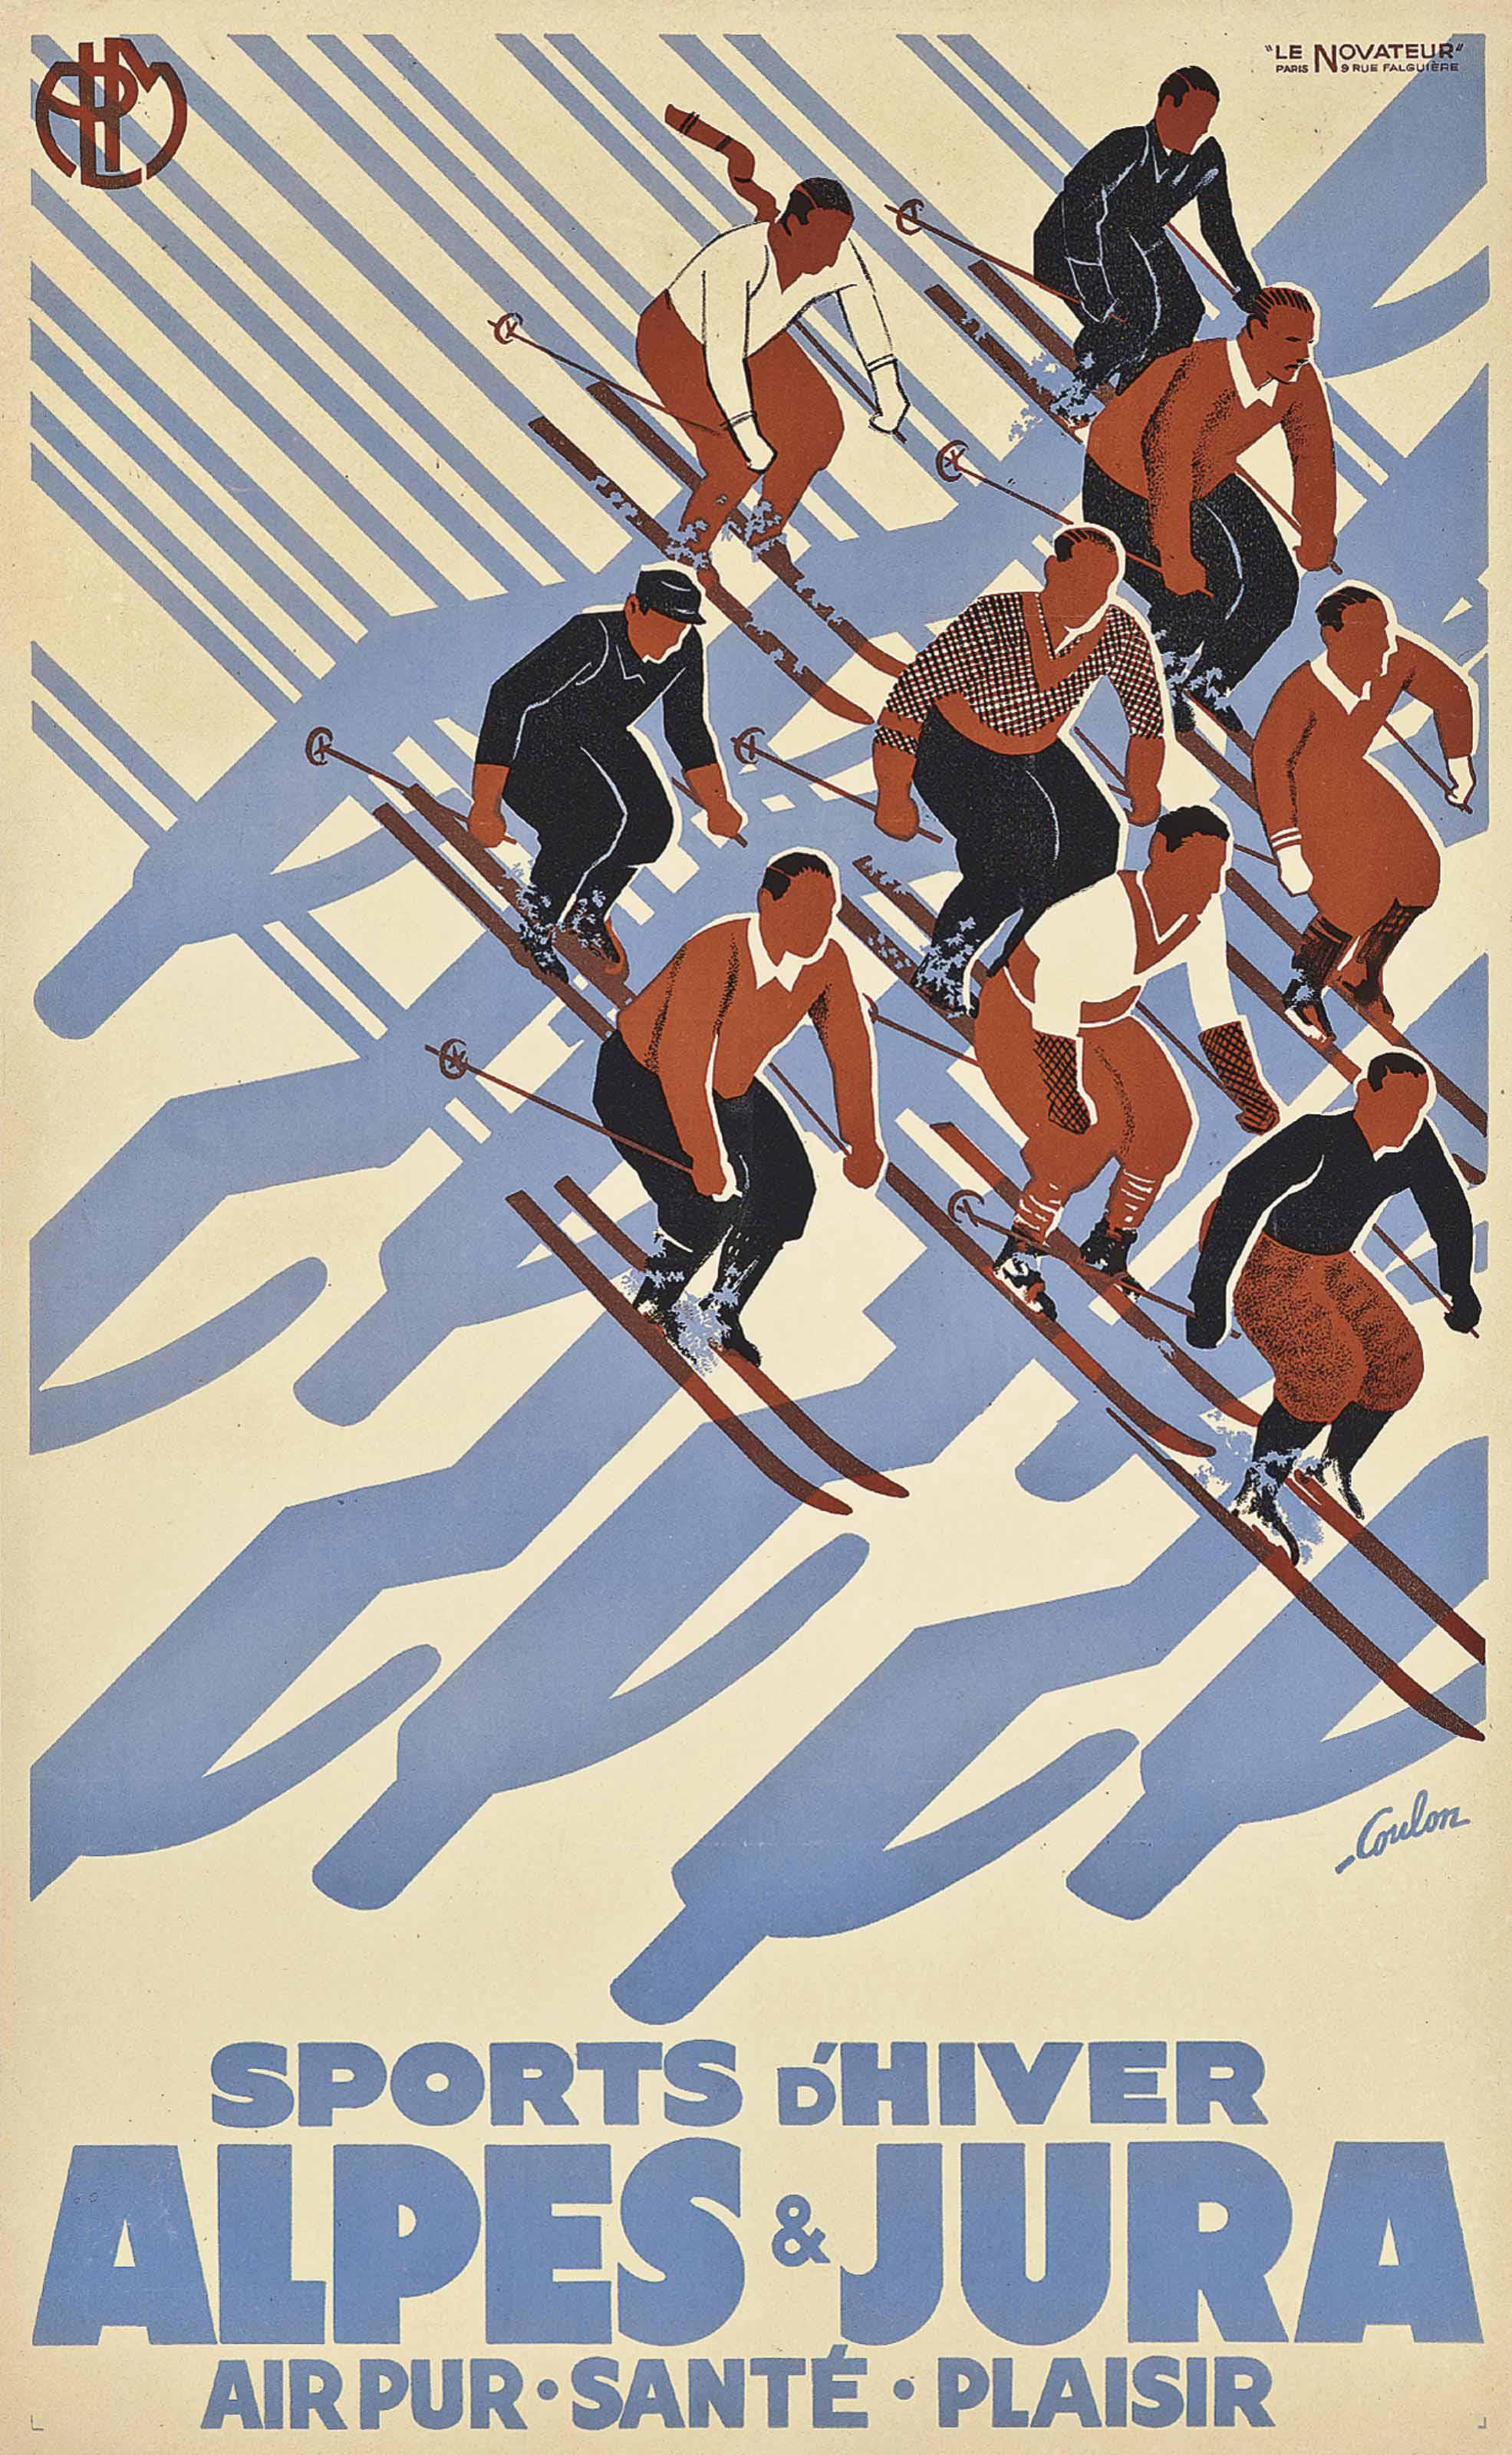 Eric de Coulon (1888-1956)